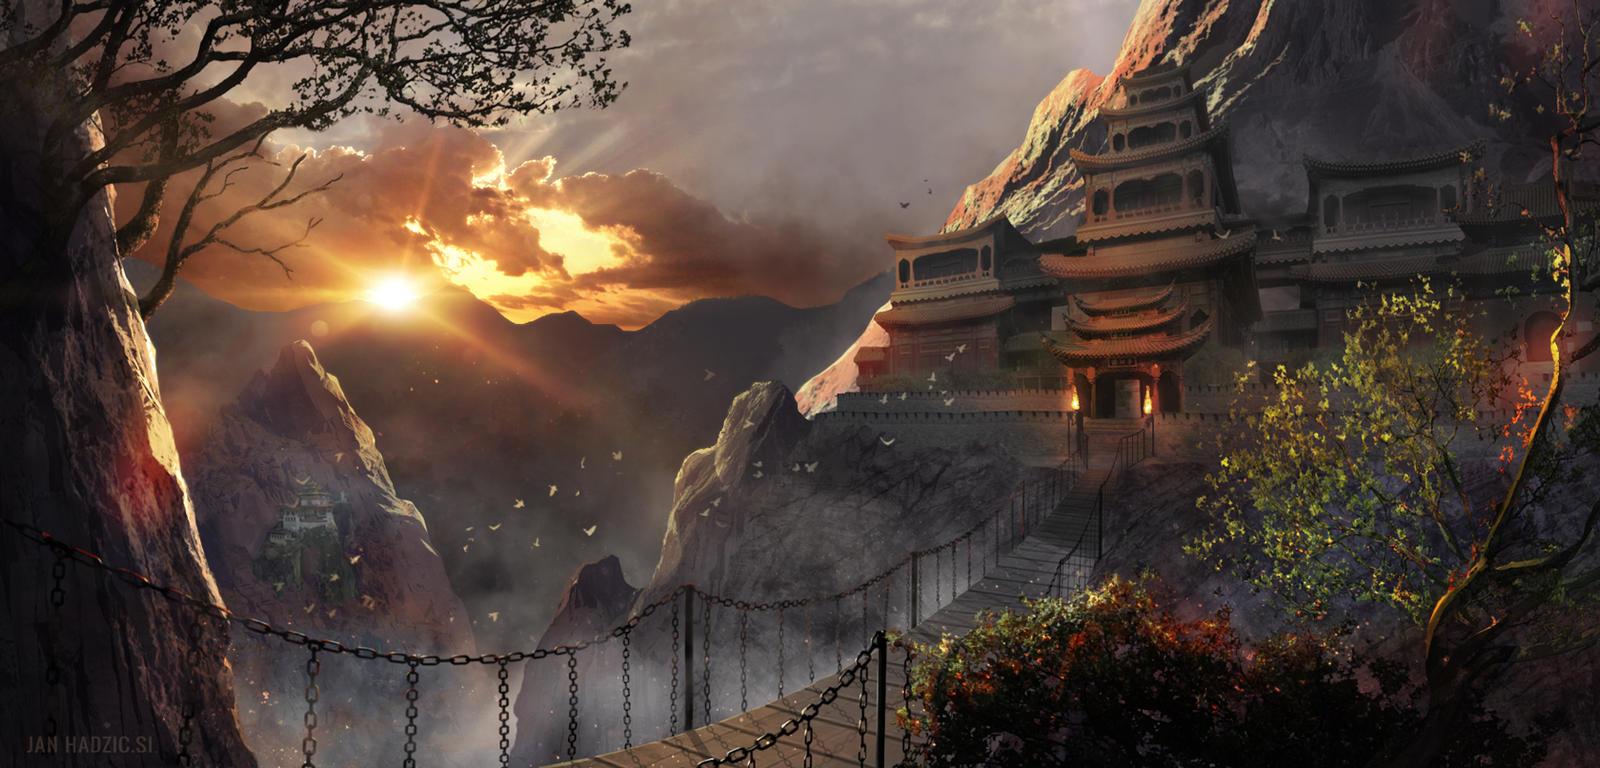 Temple-Sunrise by atma33